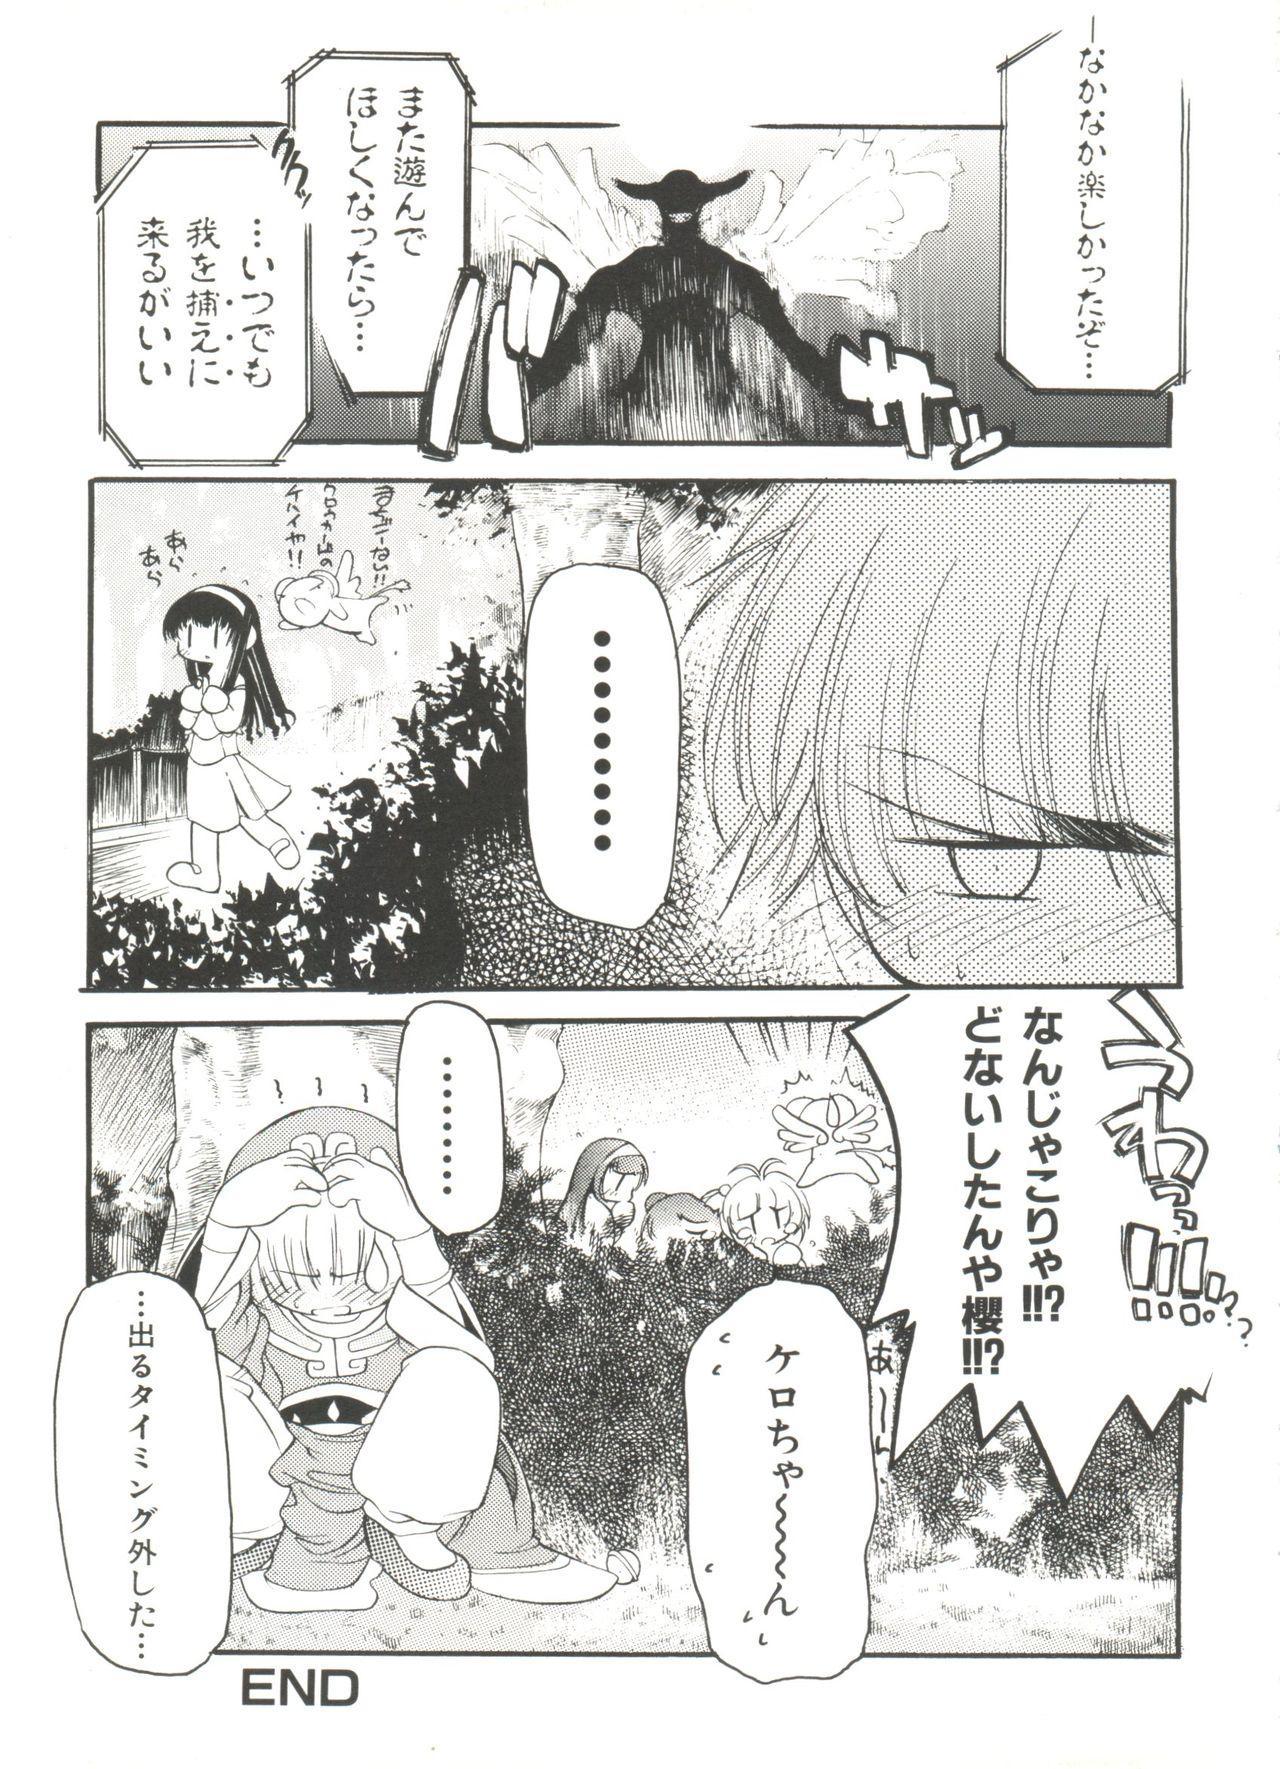 [Anthology] Denei Tamatebako 8 - Utakata no Tenshi-tachi II (Various) 14